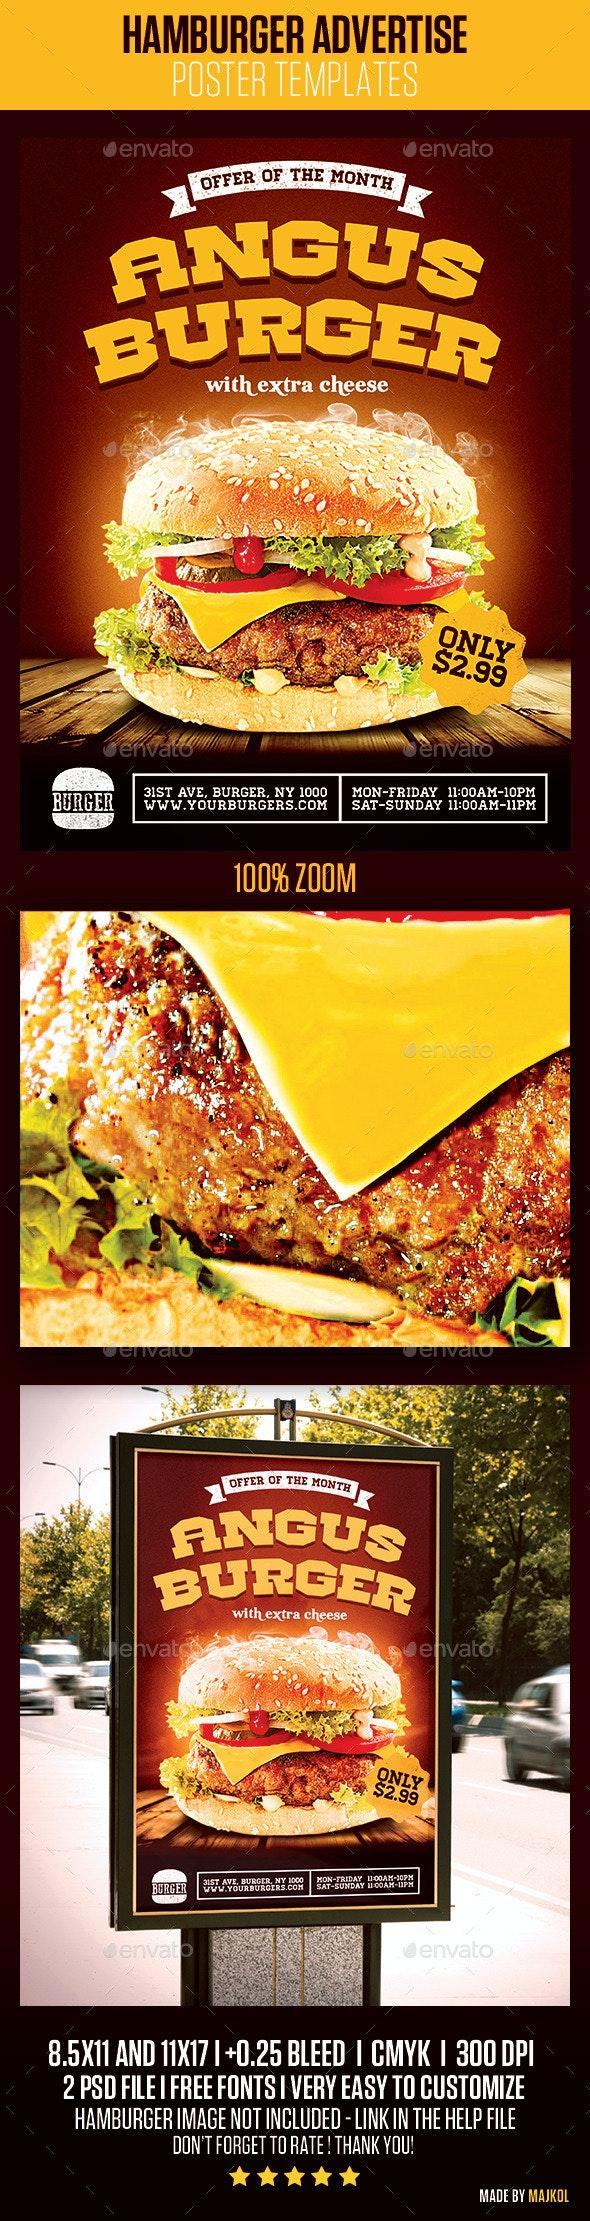 Hamburger Advertise Posters - Restaurant Flyers